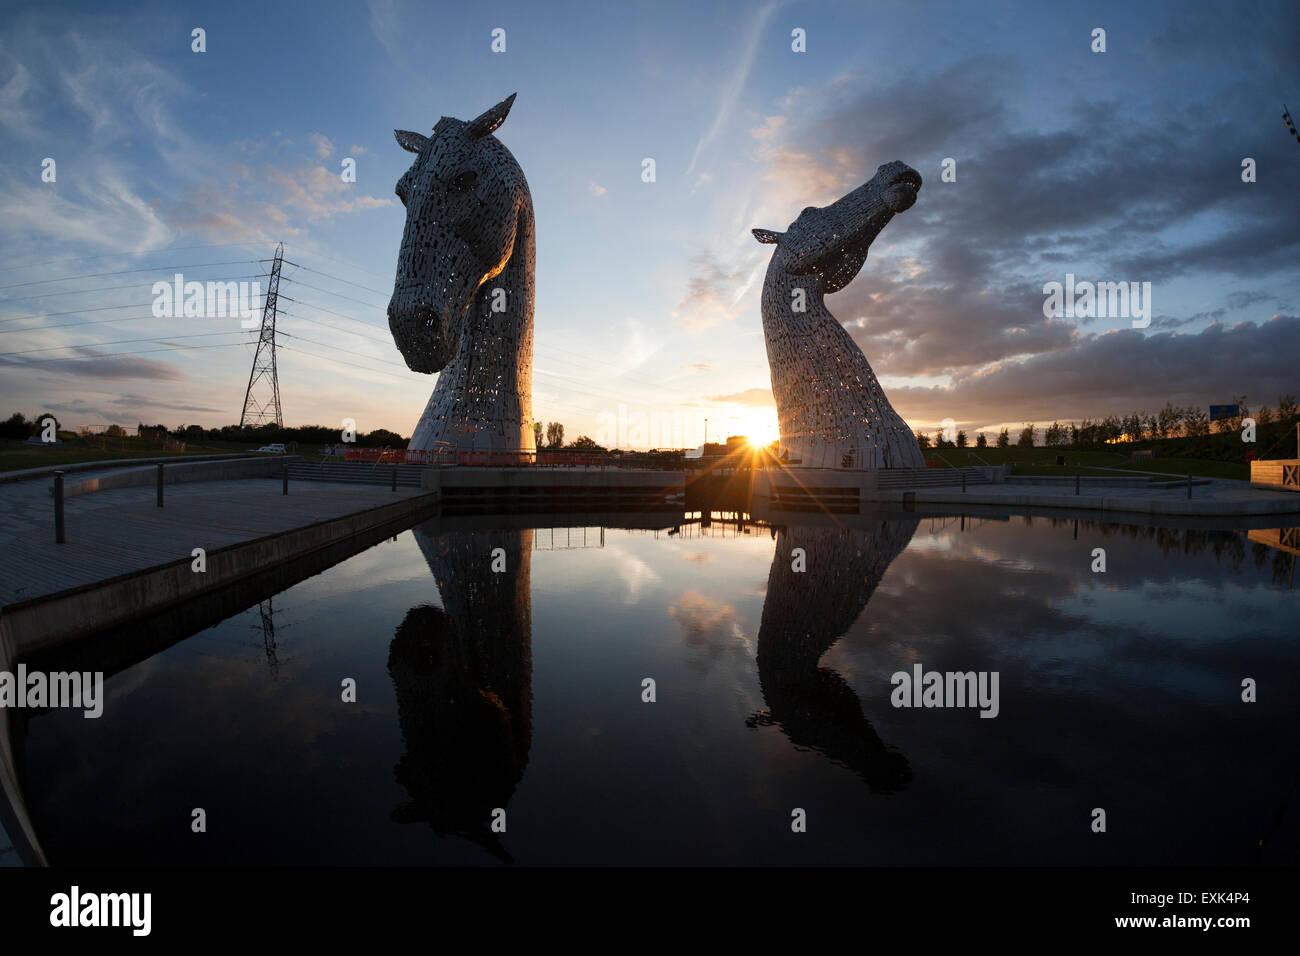 the-kelpies-sculpture-at-sunset-falkirk-